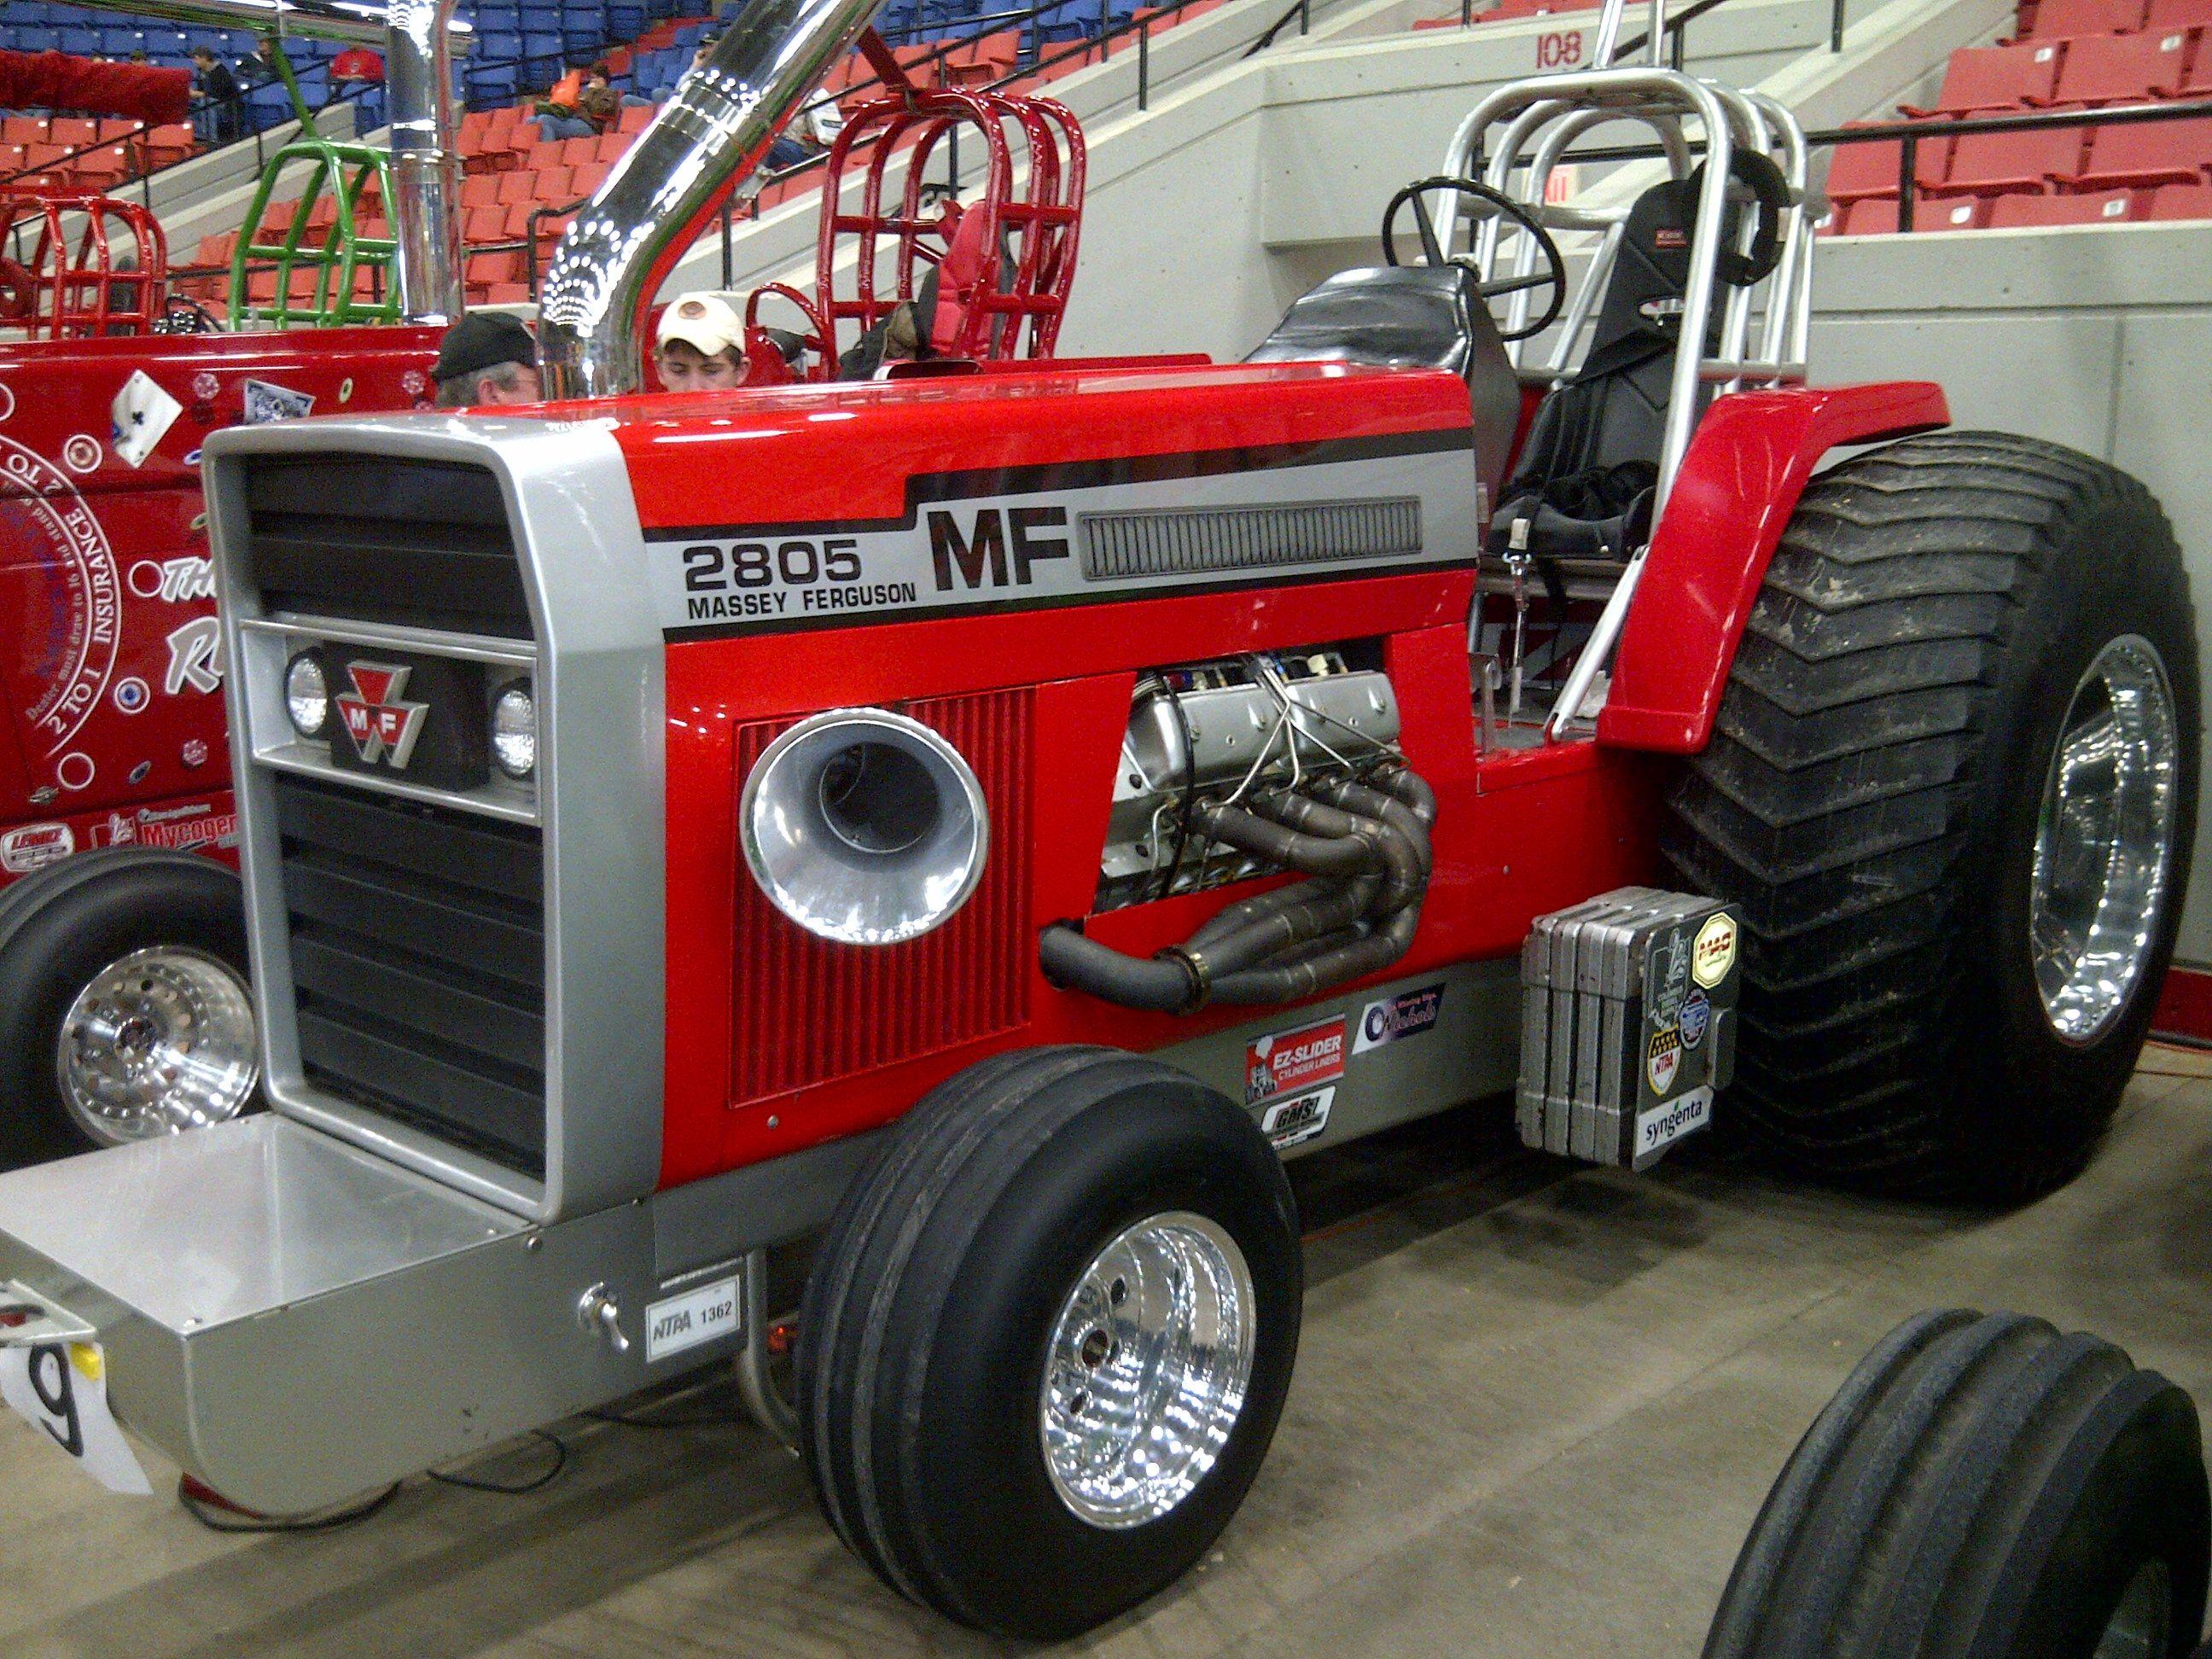 Ferguson Tractor Wiring Diagram Get Free Image About Wiring Diagram